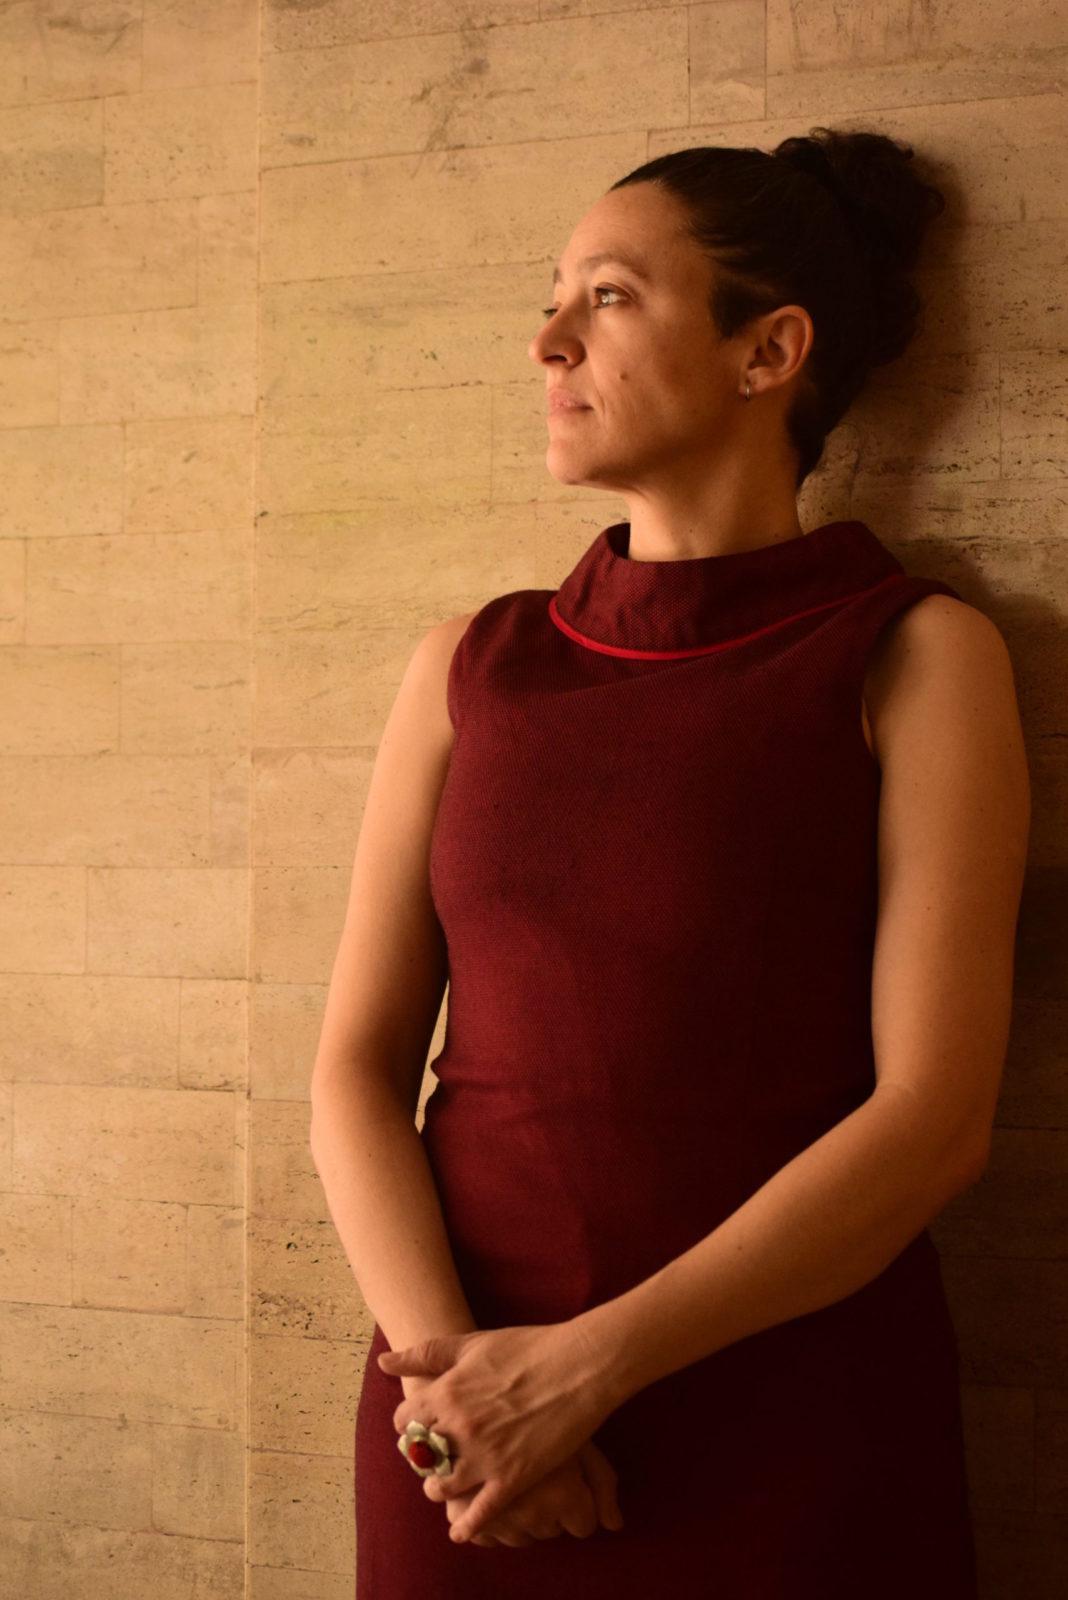 Meruane, Lina (Lorena Palavecino) - Zach Cihlar